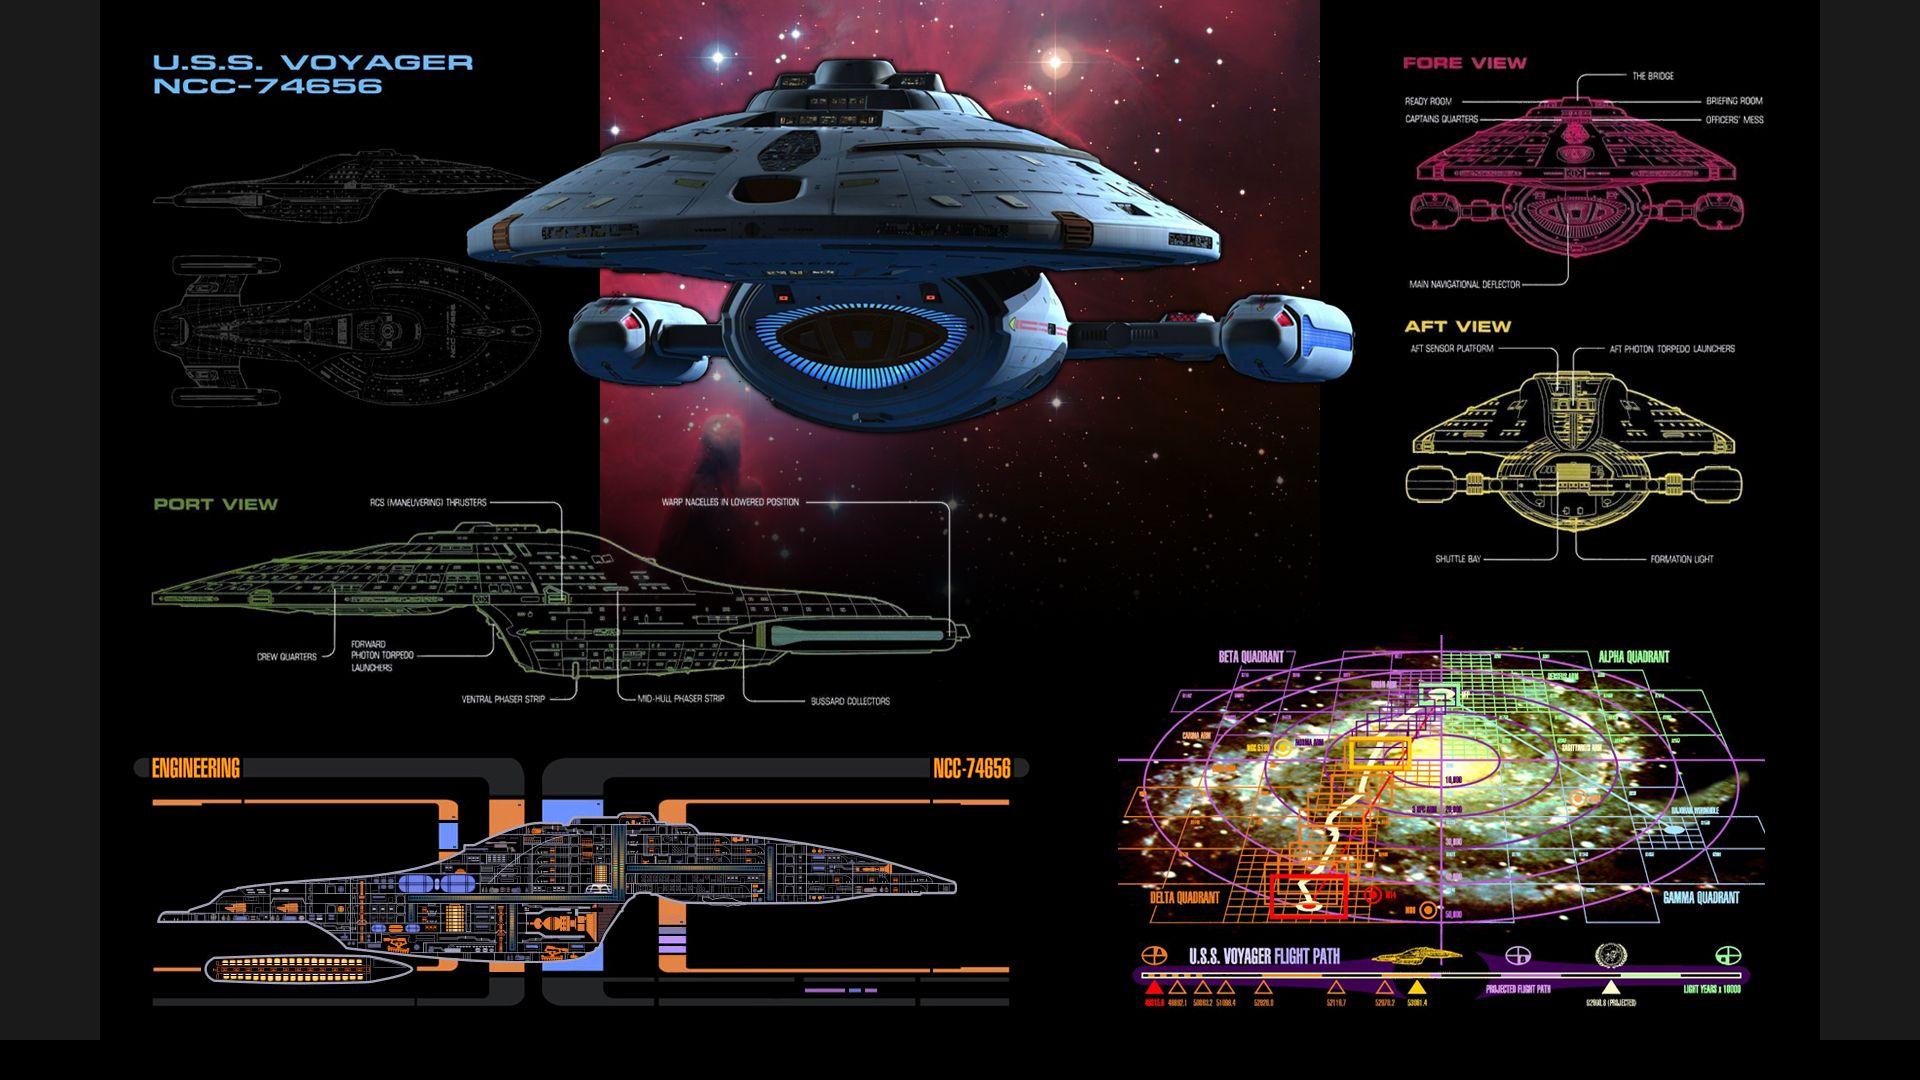 Star Trek Voyager schematics wallpaper with side panels for desktop icons.  | Fandom star trek, Star trek ships, Star trek voyager | Voyager Schematics |  | Pinterest